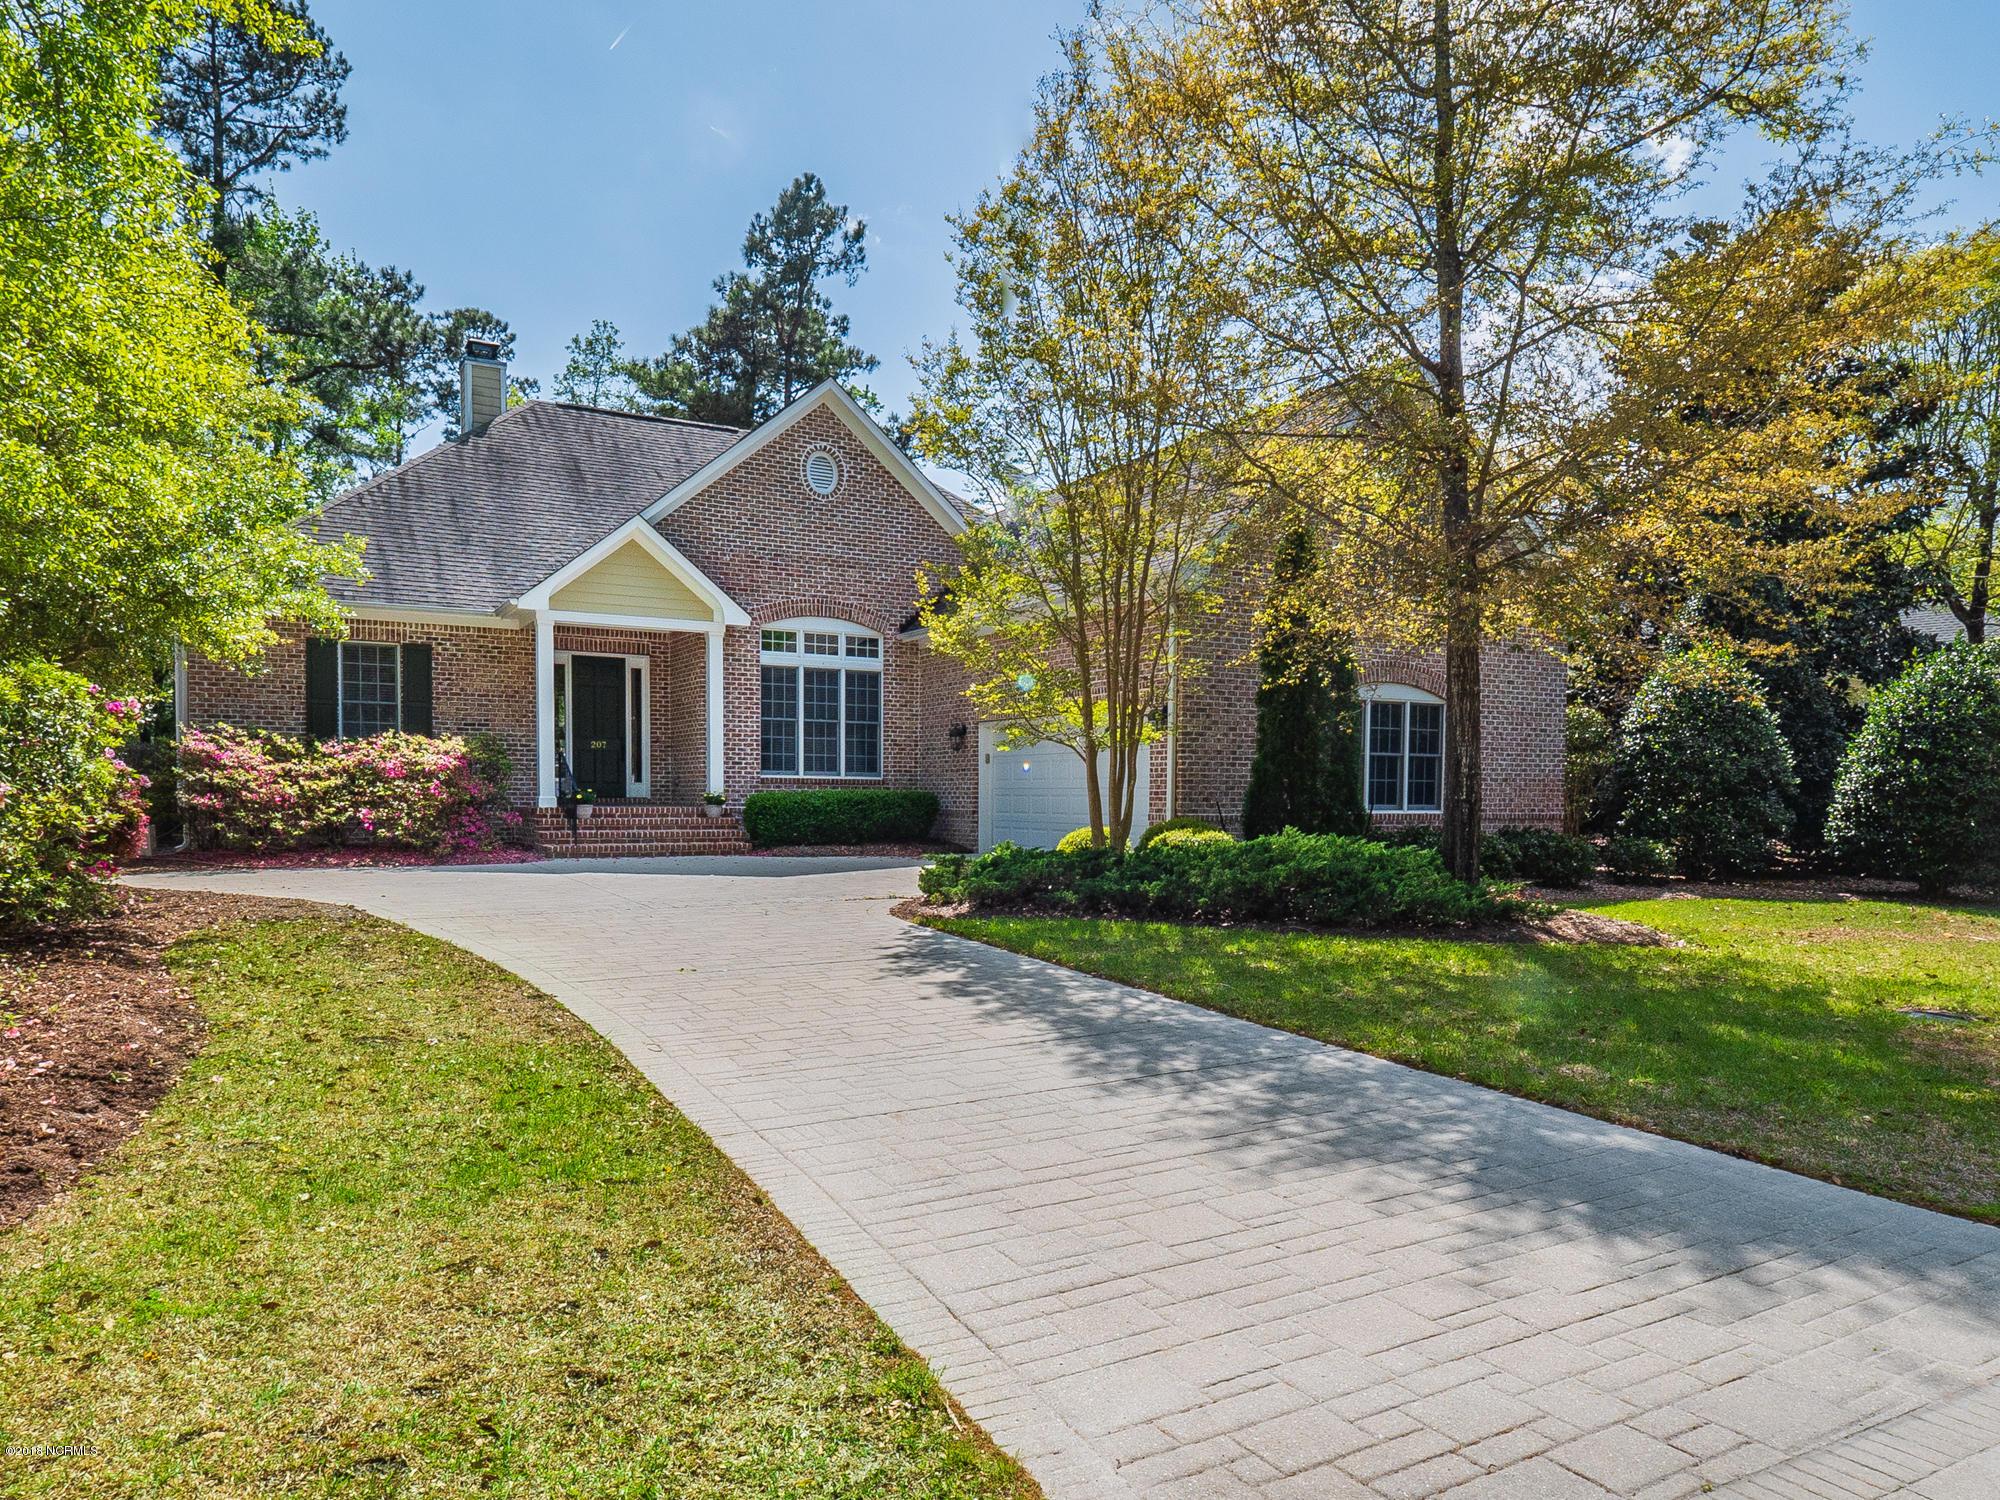 Carolina Plantations Real Estate - MLS Number: 100112241